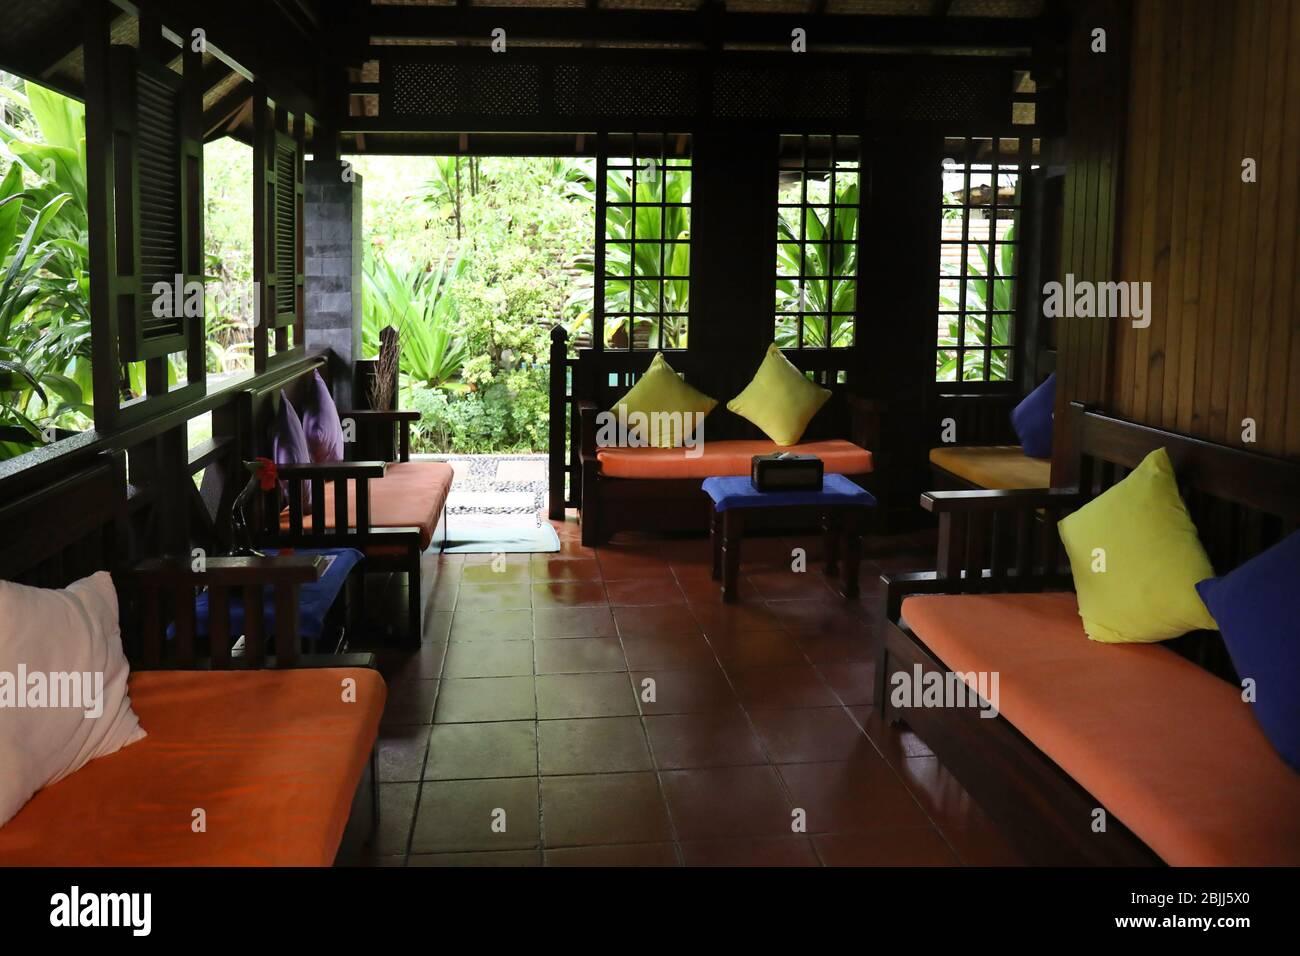 Interior Om Spa Salon At Resort Stock Photo Alamy